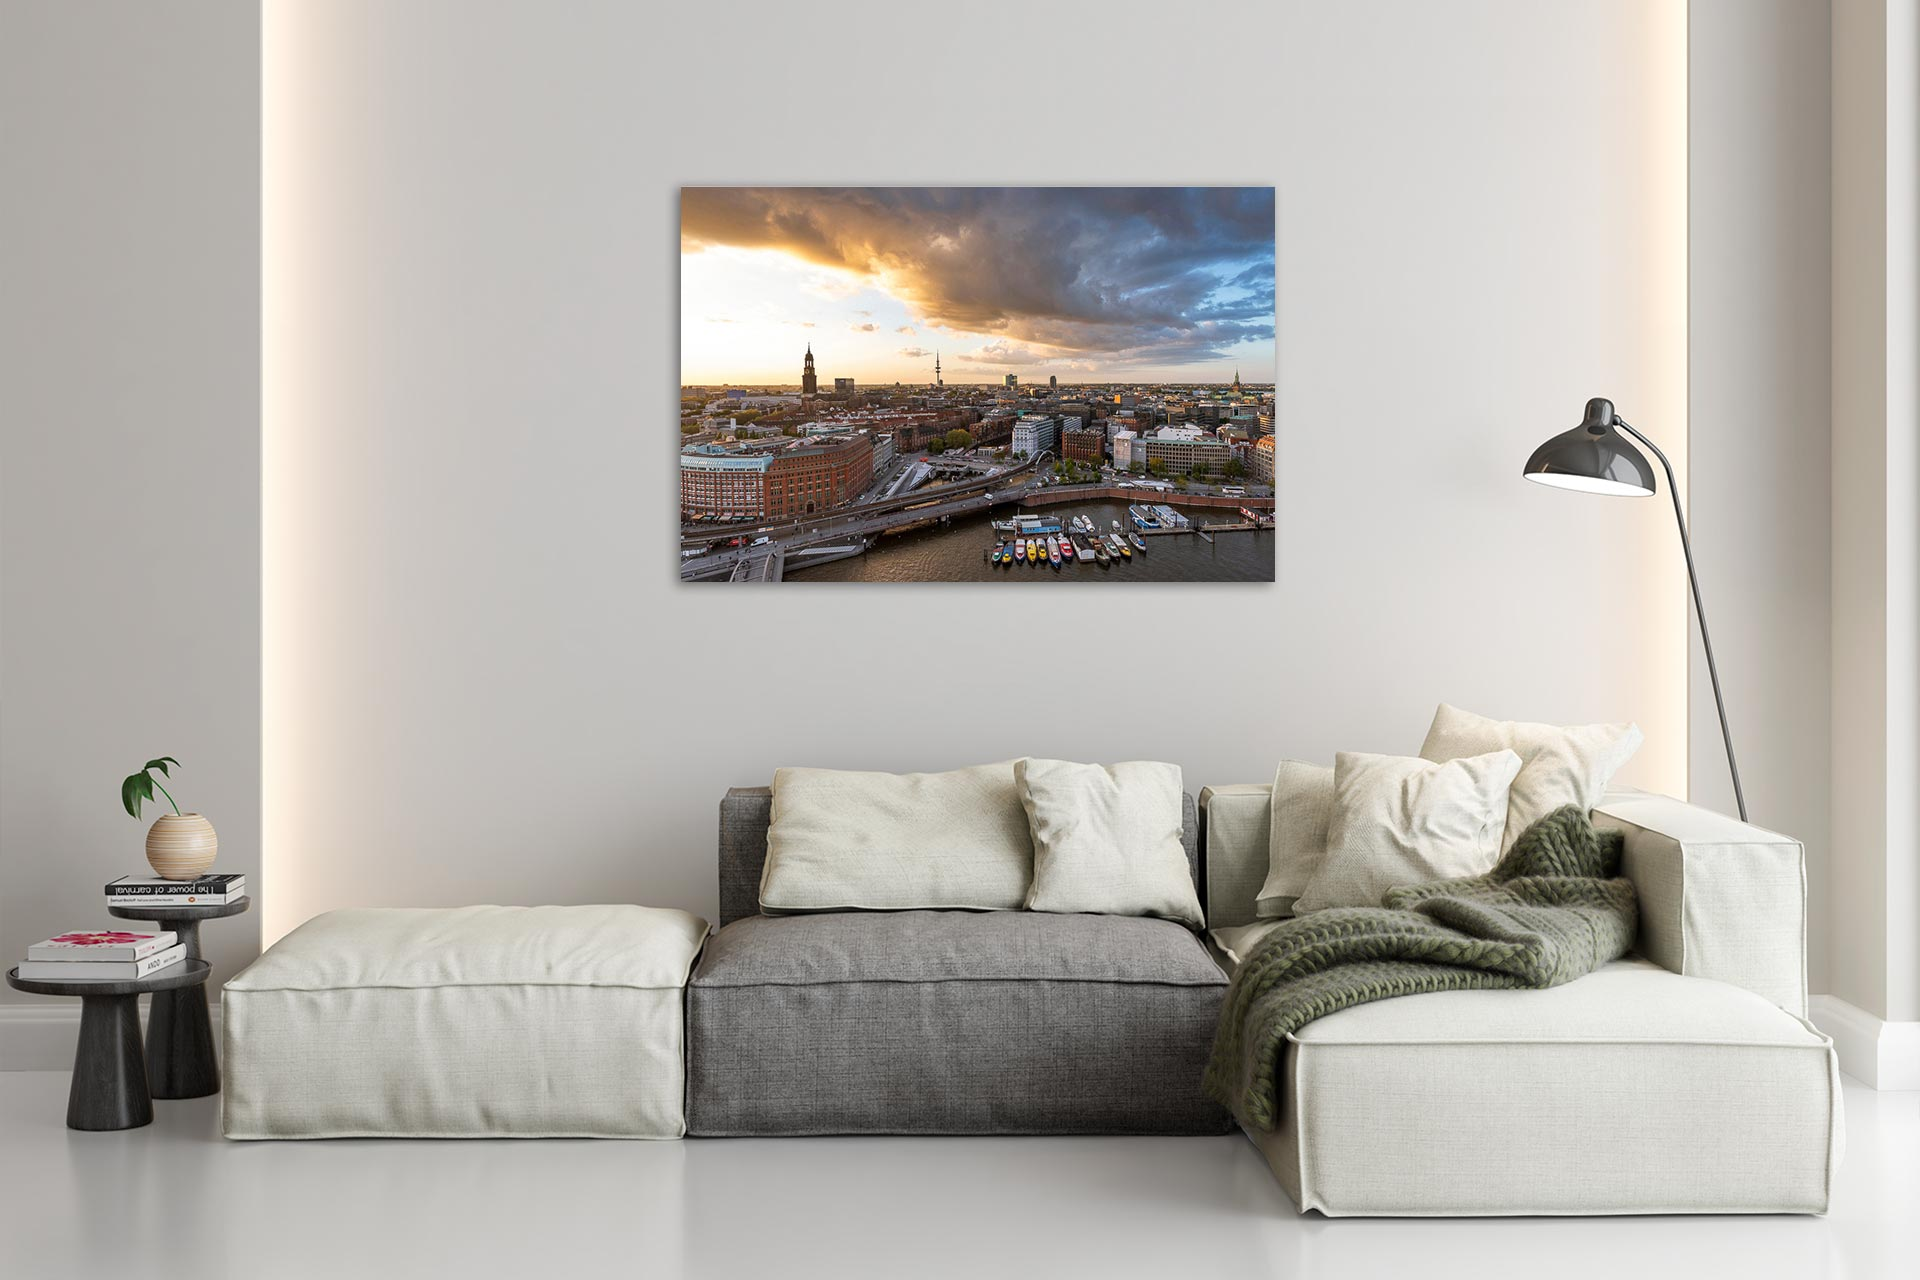 JS301-binnenhafen-hamburg-wandbild-bild-auf-leinwand-acrylglas-aludibond-wohnzimmer